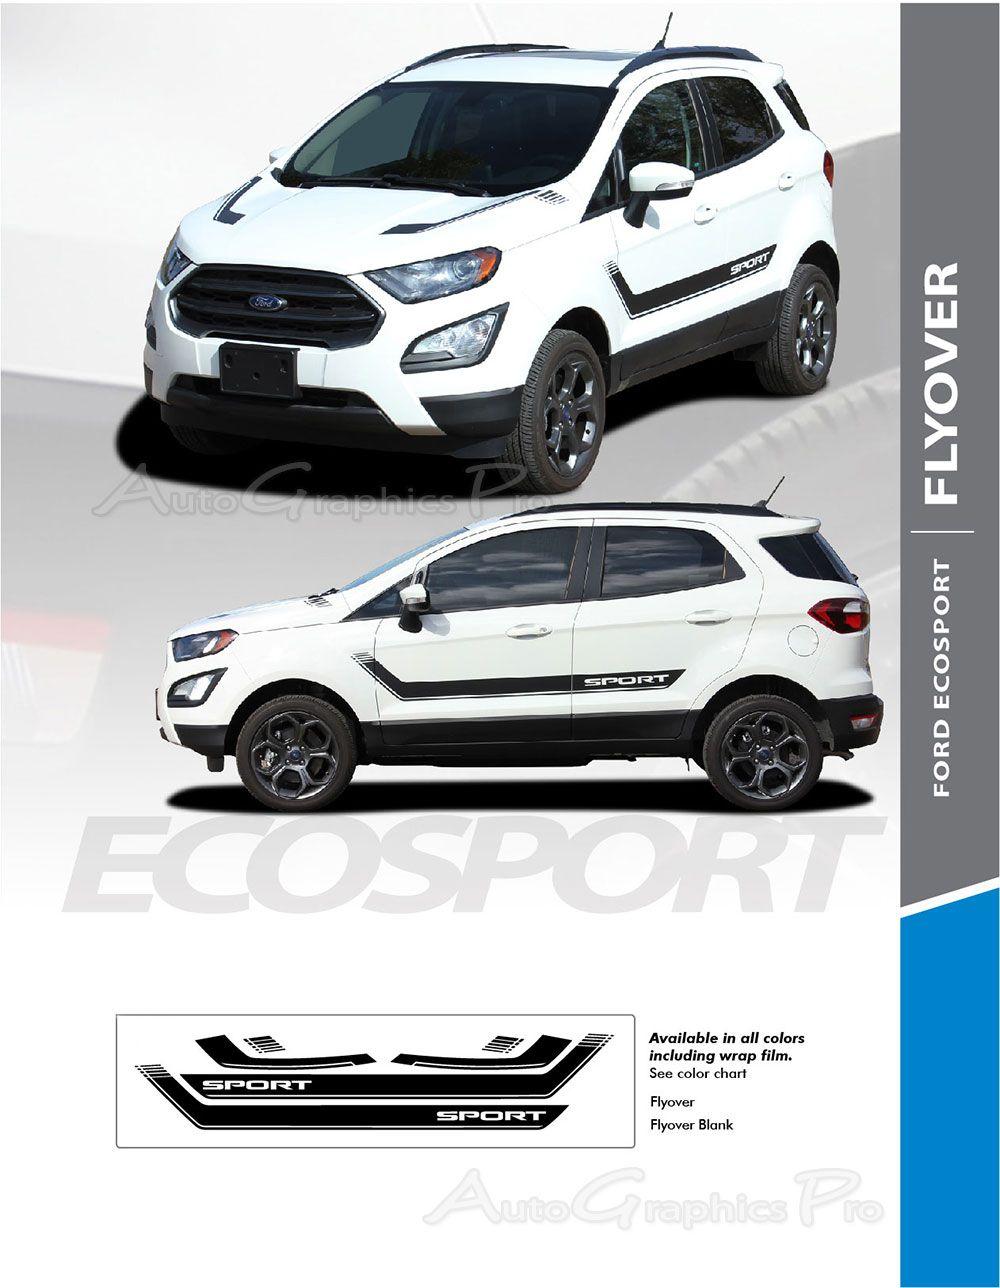 2013 2020 Ford Ecosport Flyout Side Door Decal And Hood Vinyl Stripe Graphic Kit Pegatinas Para Autos Autos Y Motos Autos